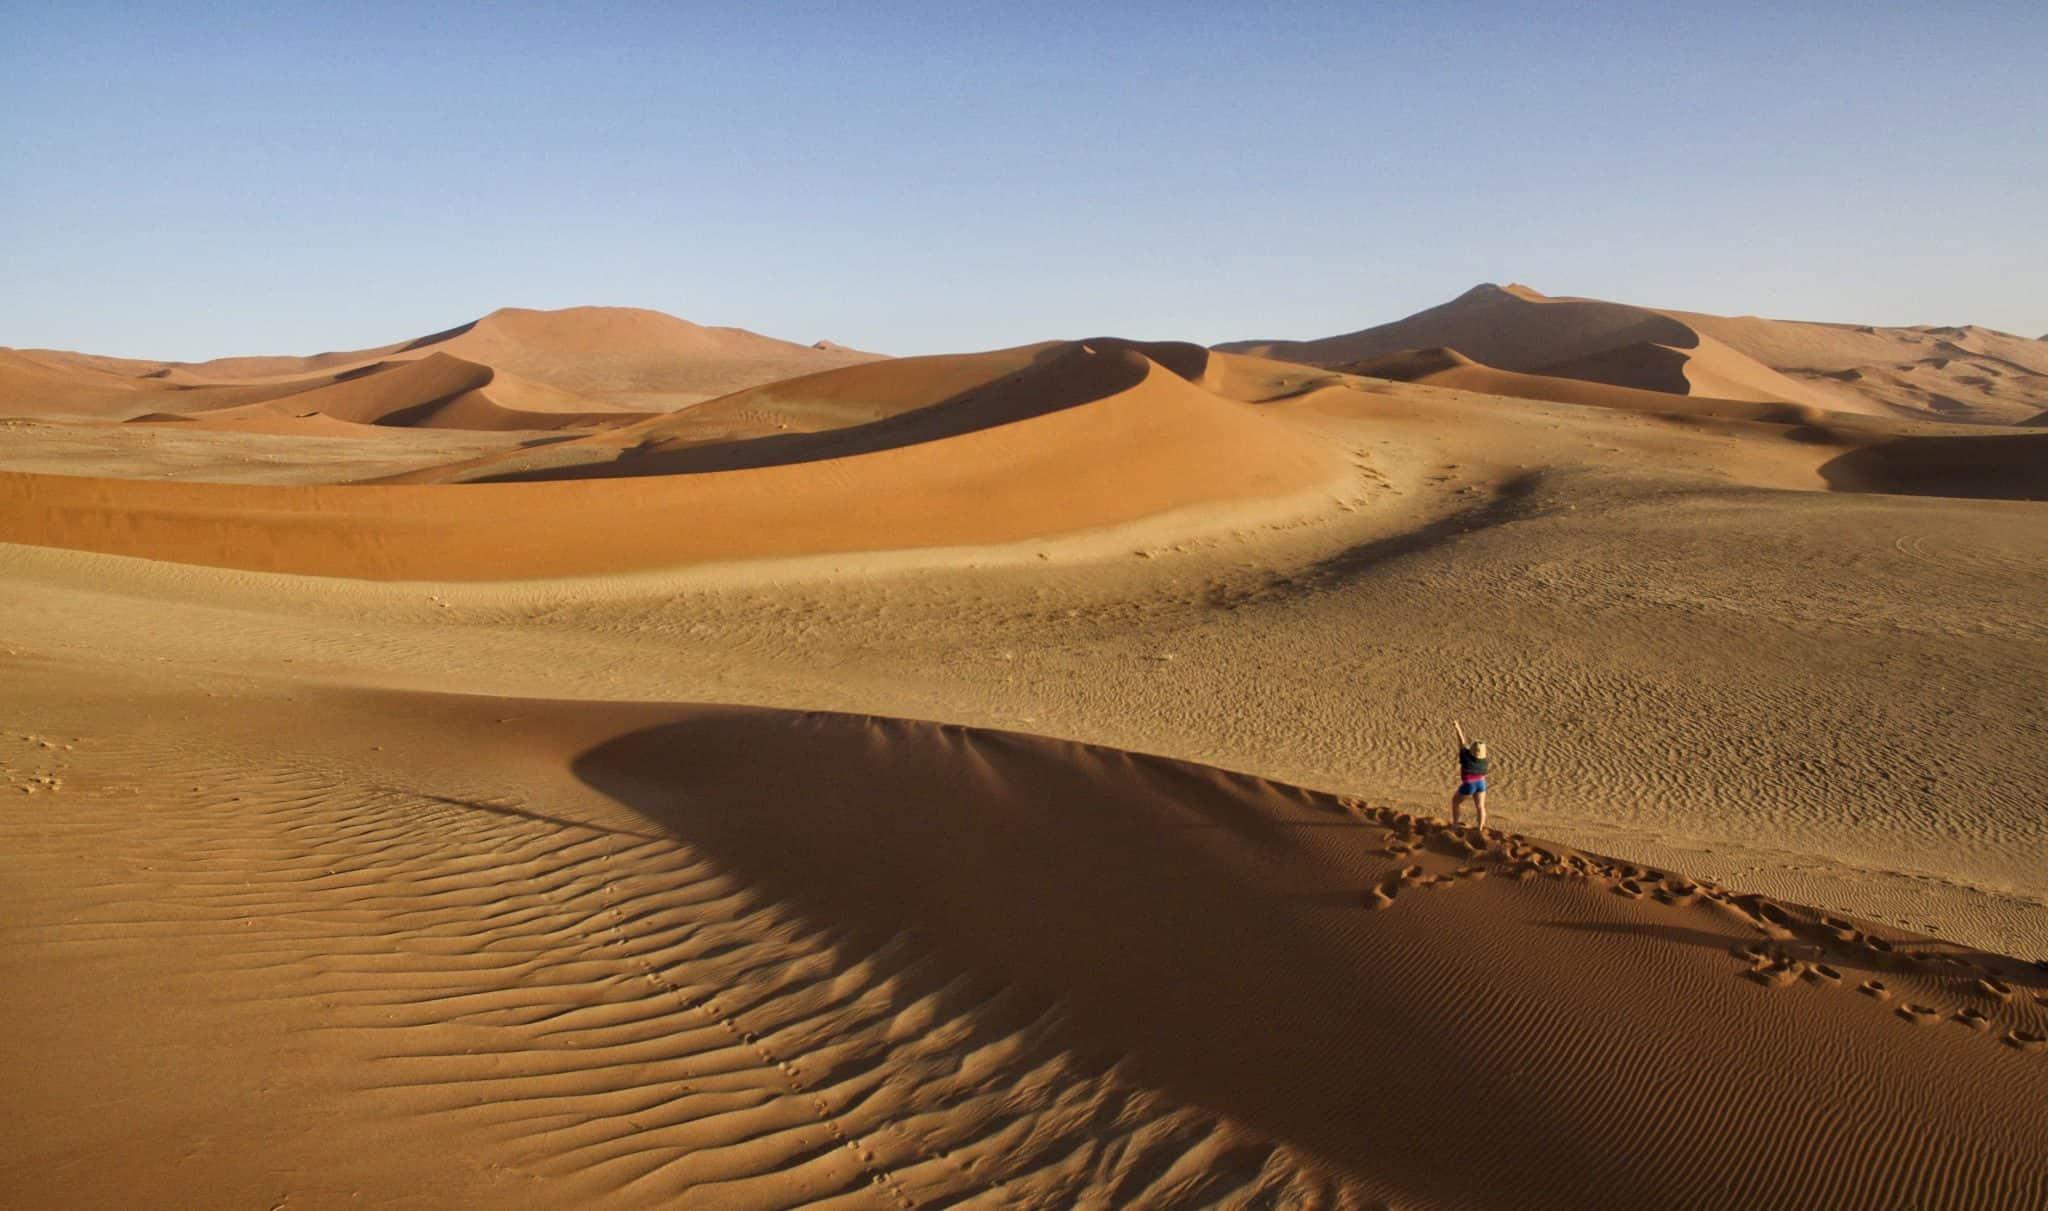 Dunes in Sossusvlei